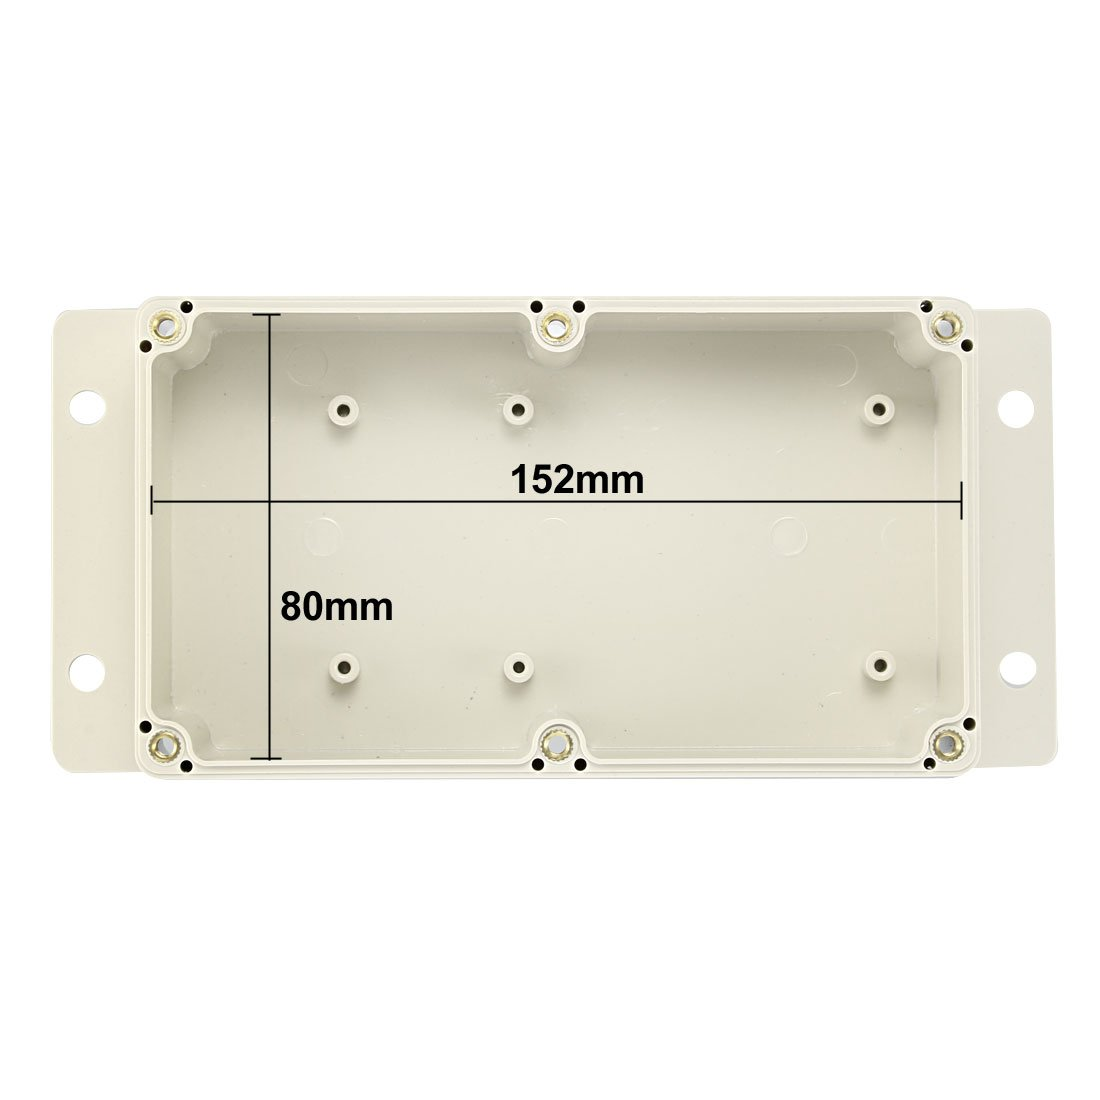 Sourcingmap 115 x 85 x 35mm Electronic Plastic DIY Junction Box Enclosure Case Gray